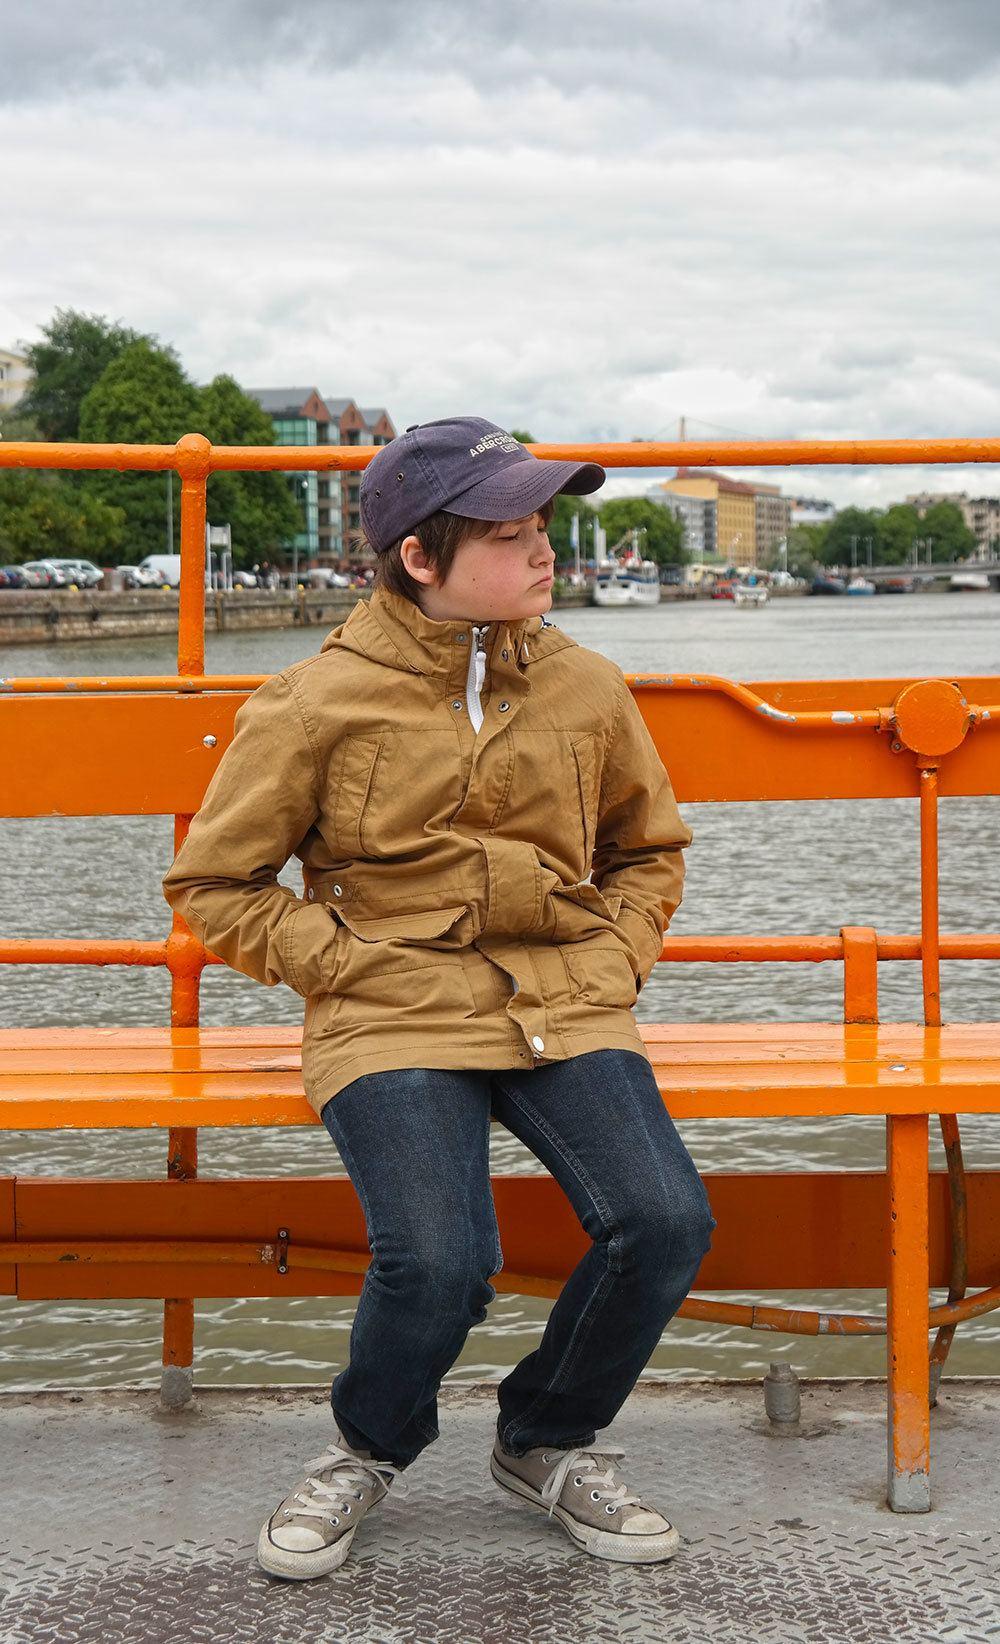 Föri in Turku. Travel photo by Katja Presnal | @skimbaco